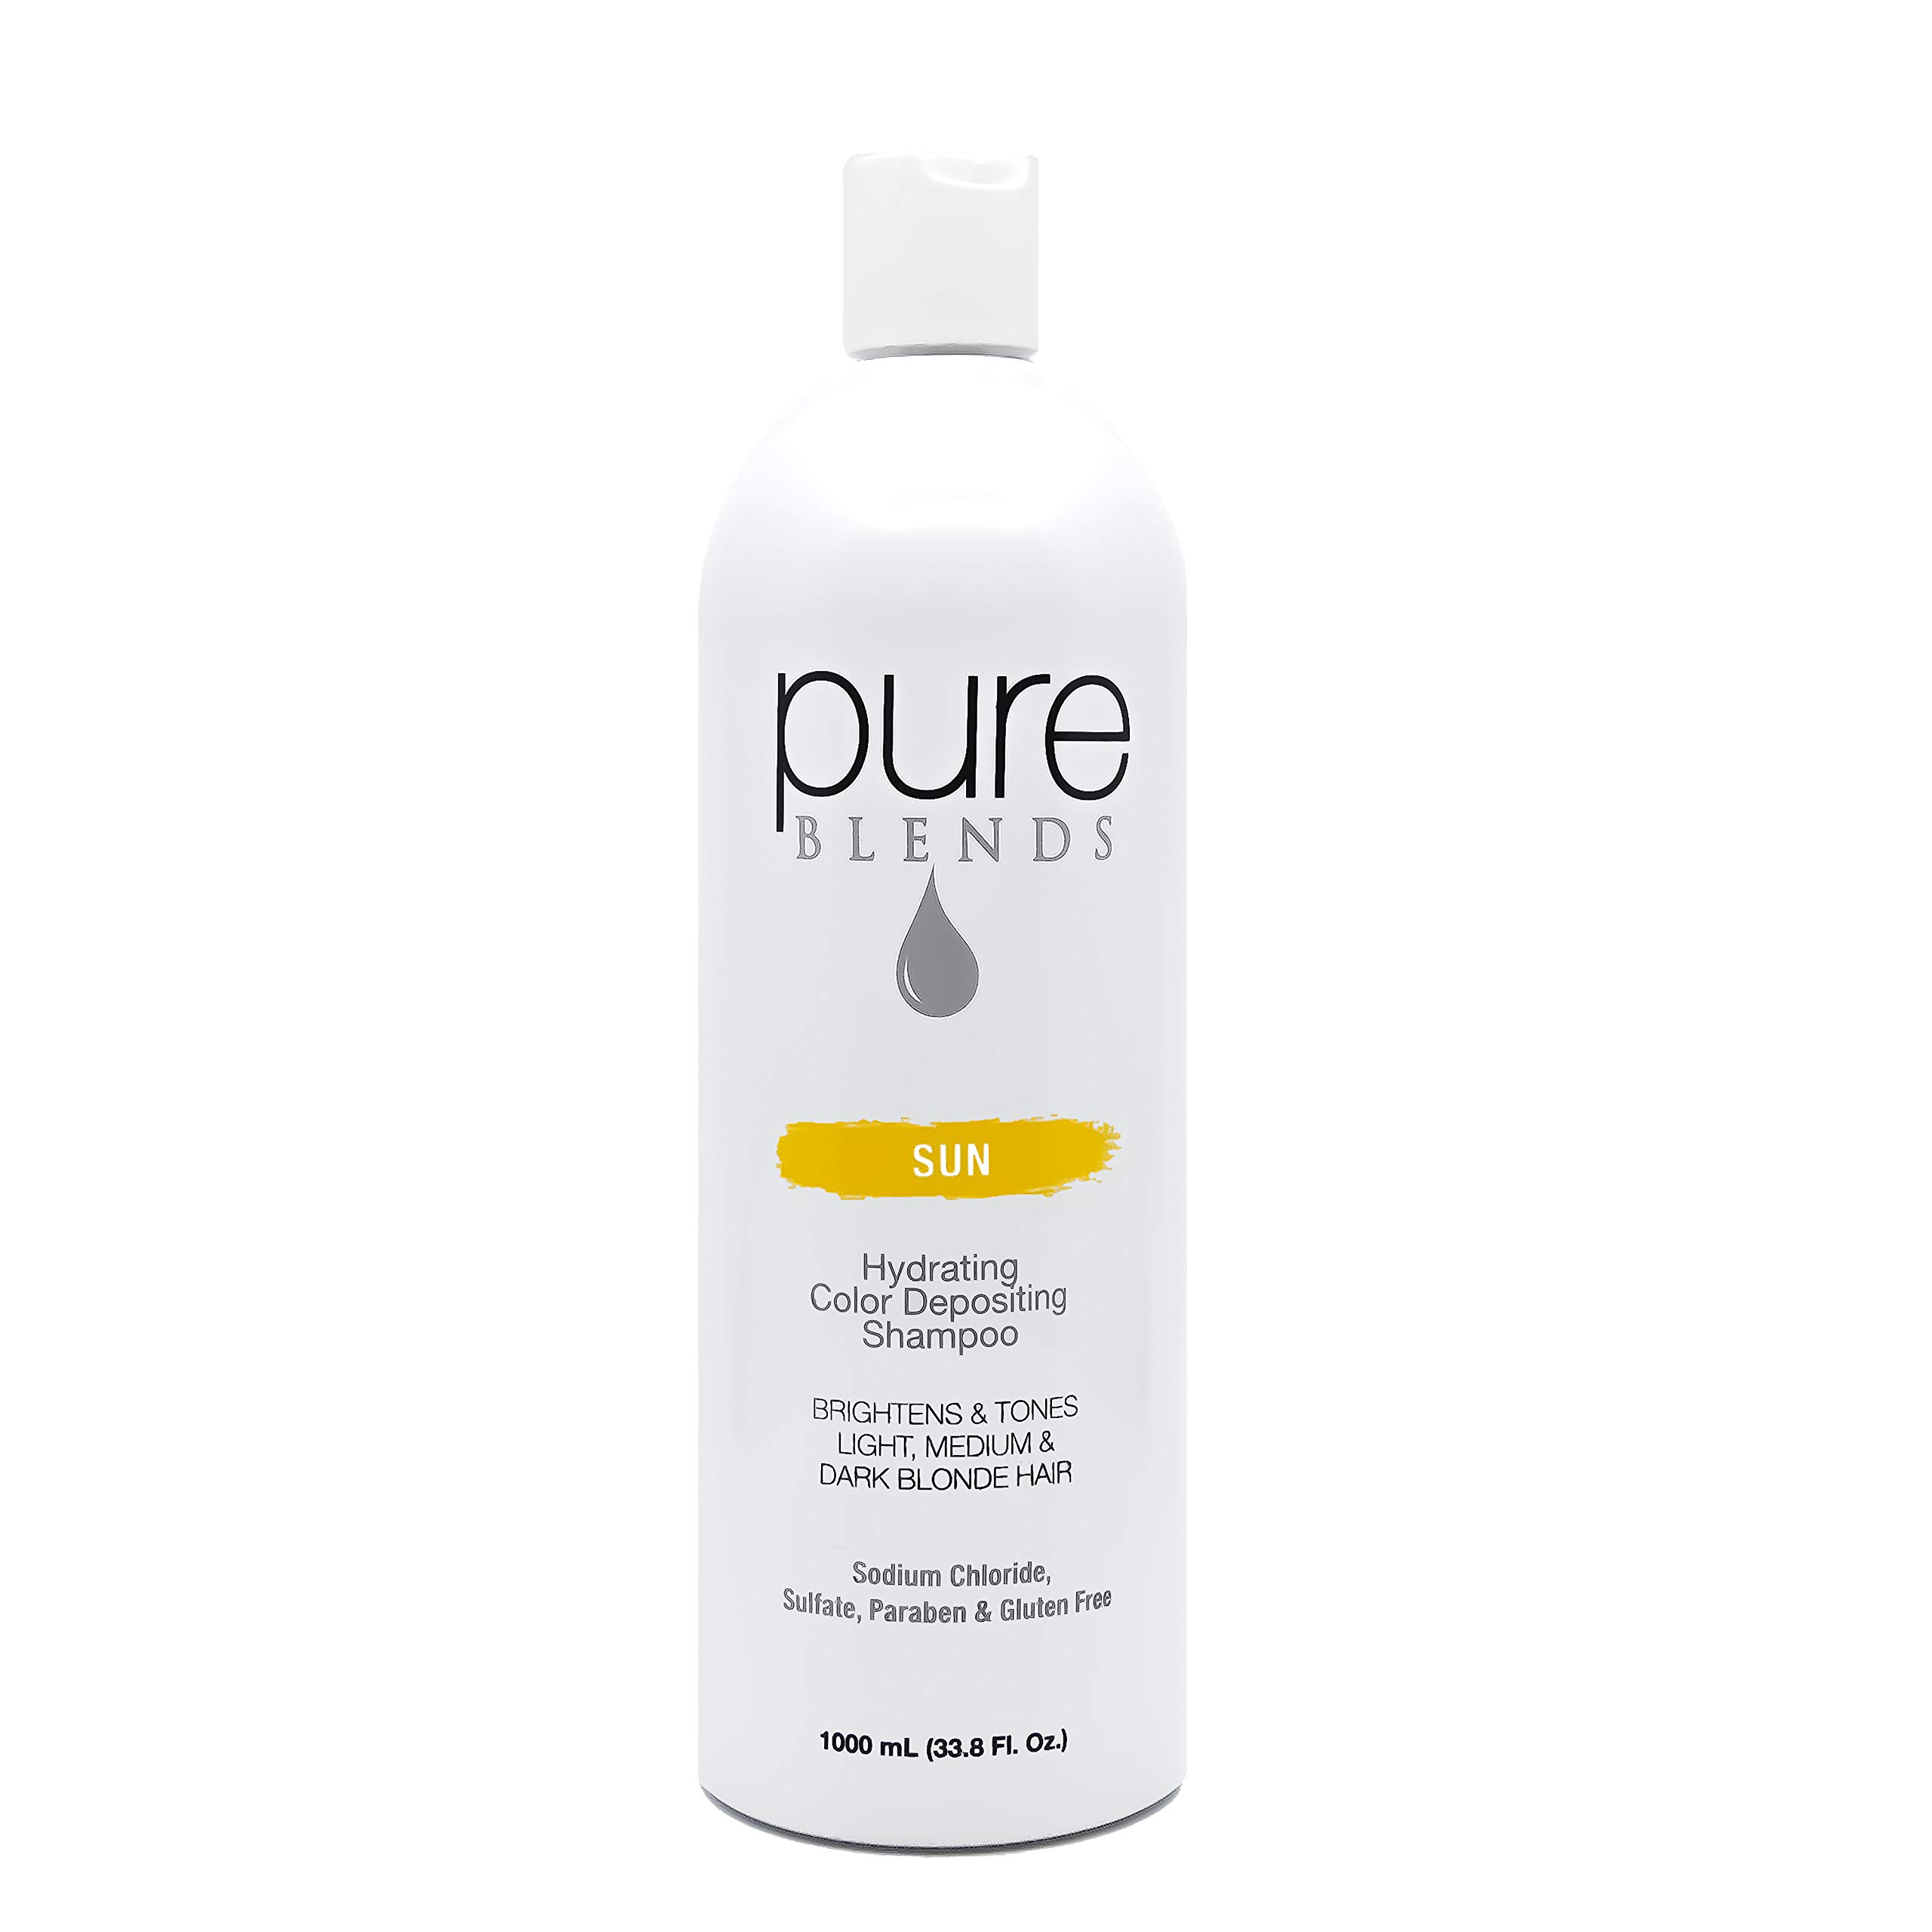 Pure Blends Hydrating Color Depositing Shampoo - Sun (Light, Medium & Dark Blonde) 33.8 Ounce - Salon Quality by Pure Blends